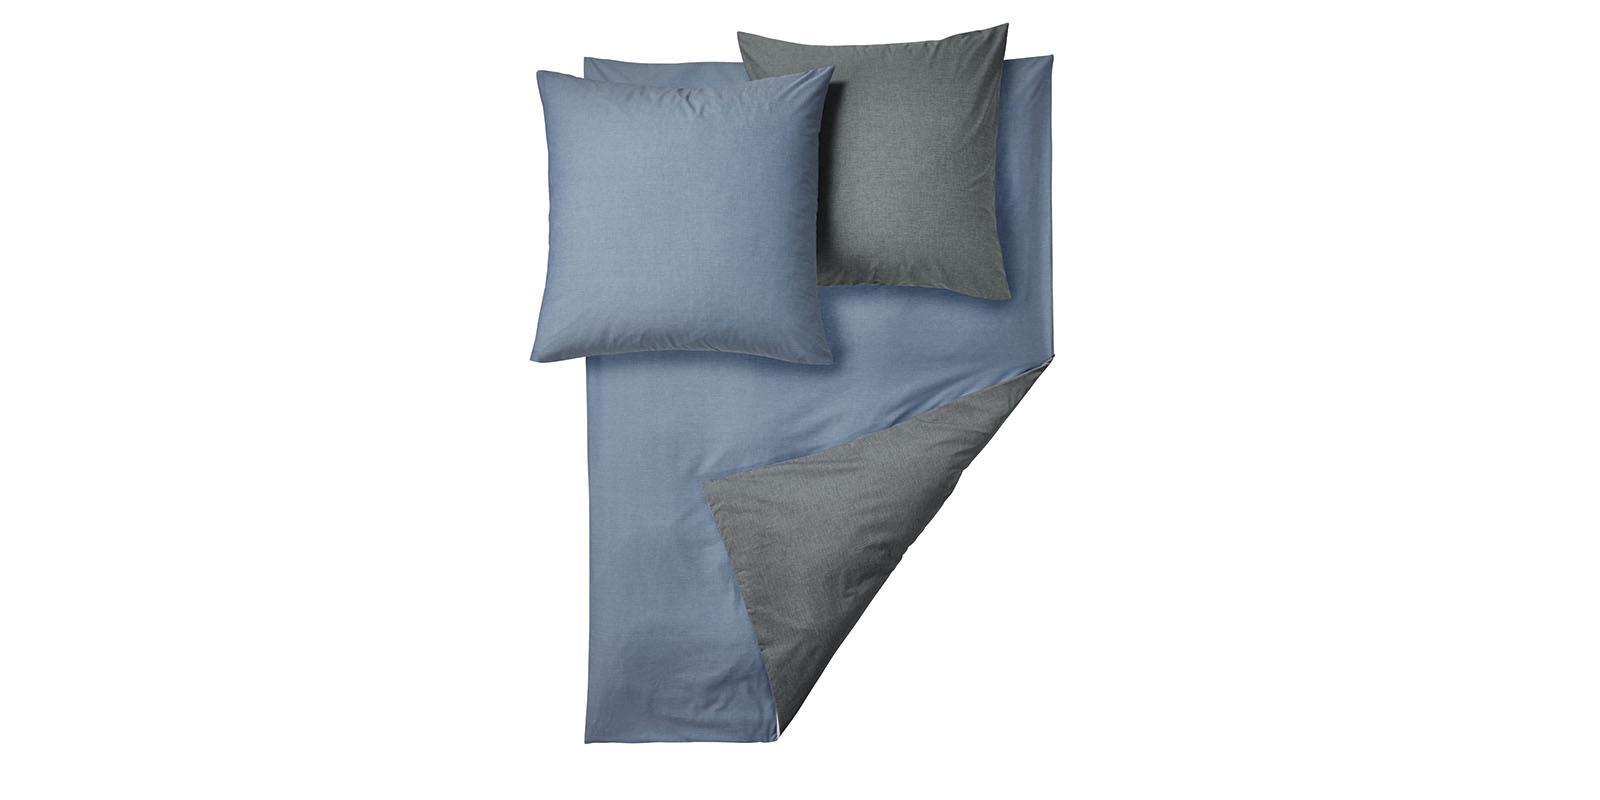 wendebettw sche king size 200x220 hellblau dunkelb. Black Bedroom Furniture Sets. Home Design Ideas